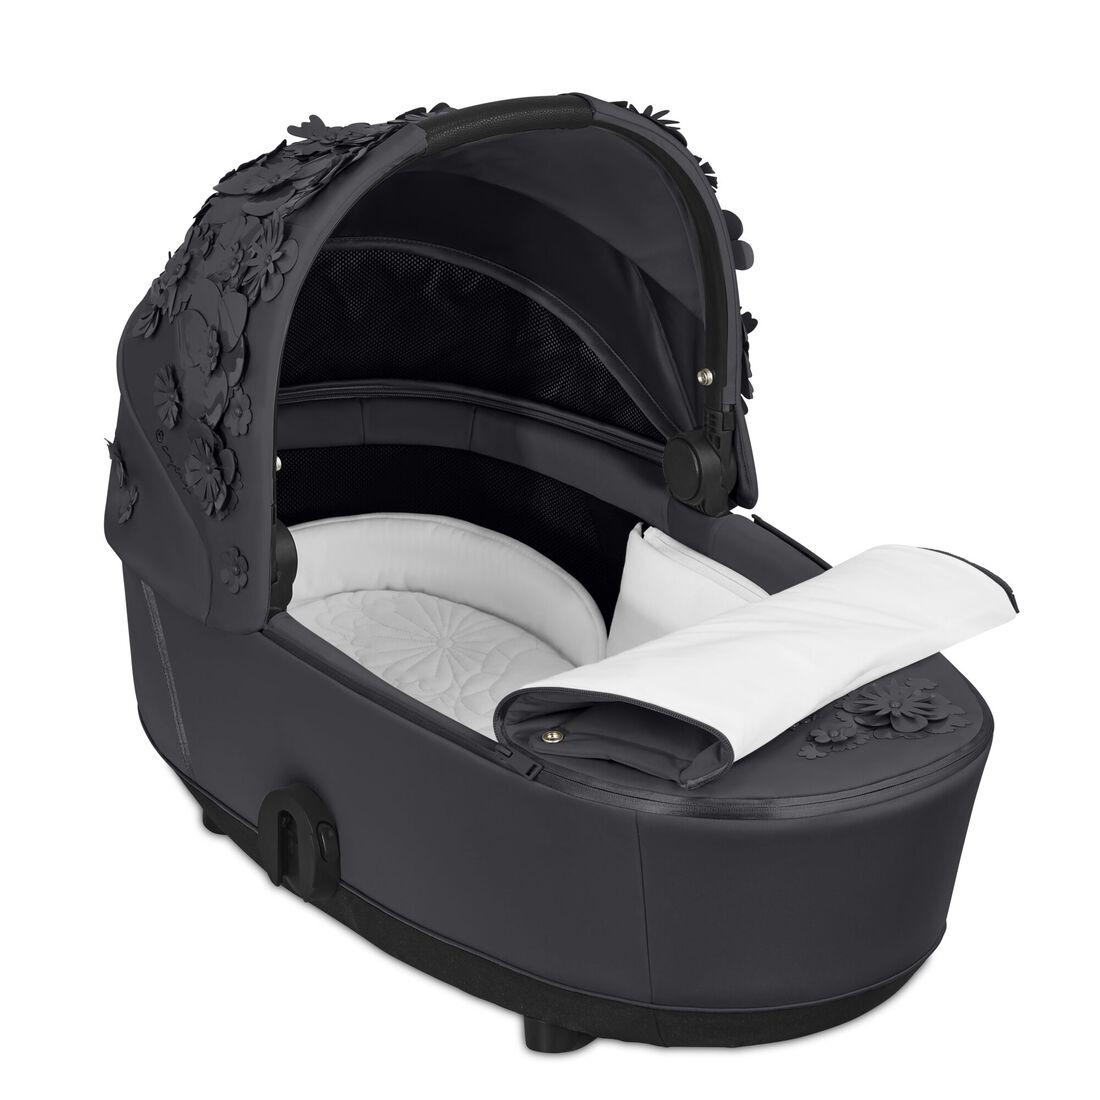 CYBEX Mios Lux Carry Cot - Dream Grey in Dream Grey large Bild 2